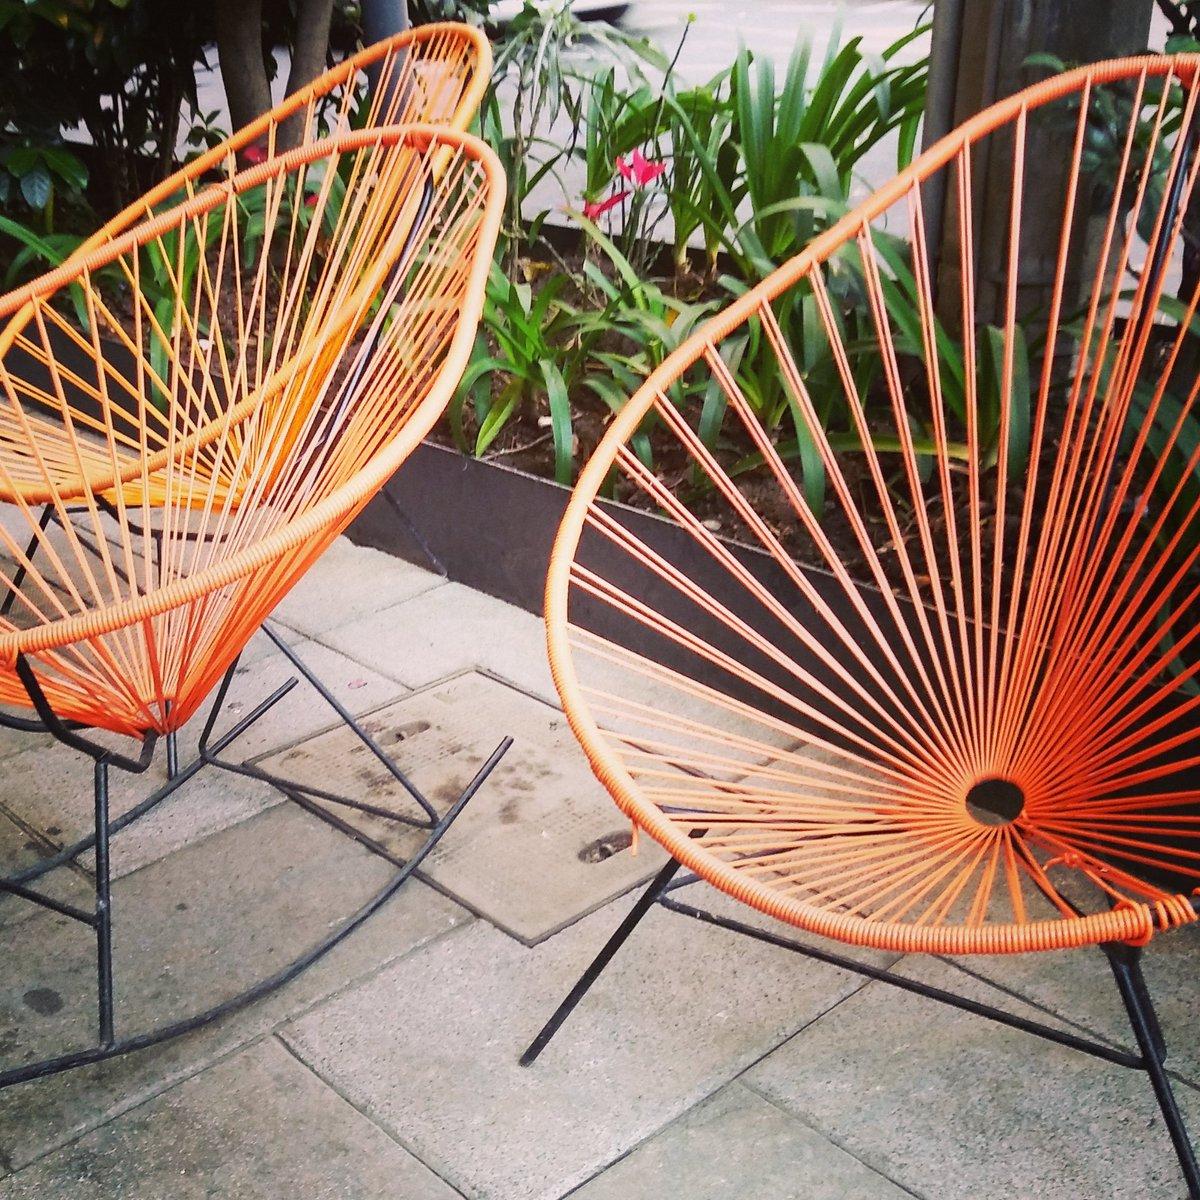 Acapulco chairs #carmenrion #condesadf #cdmx #orange #carmenrion